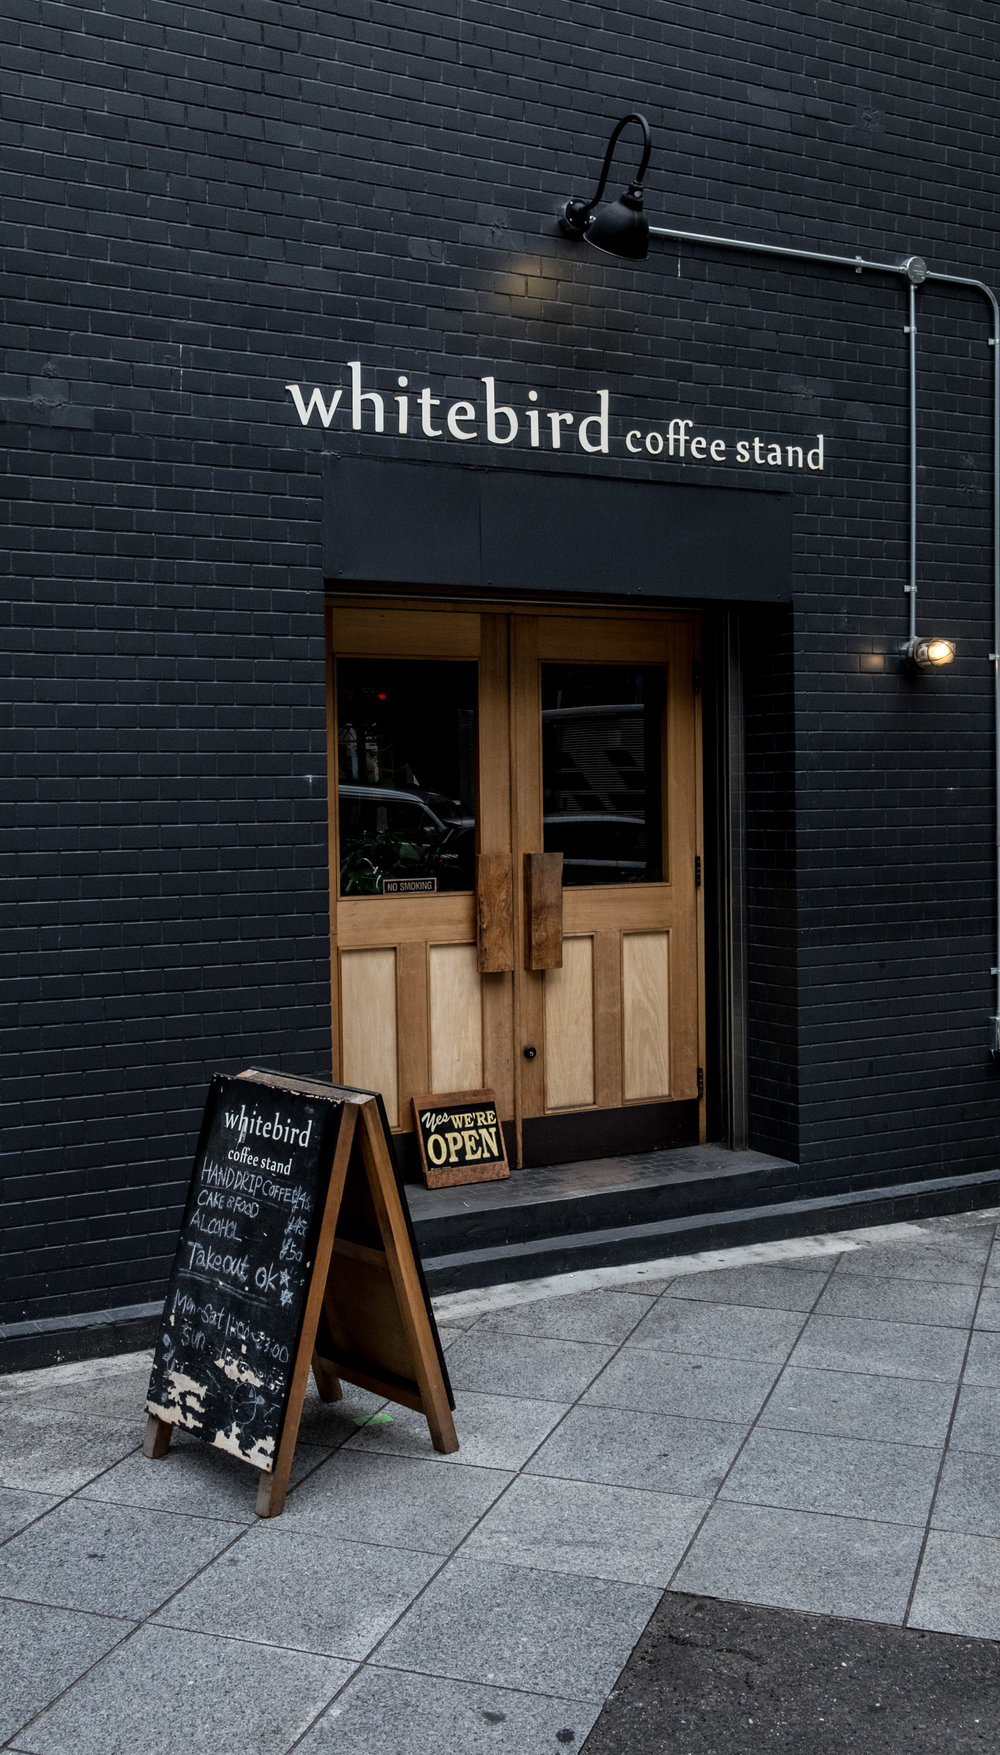 white bird coffee stand street view